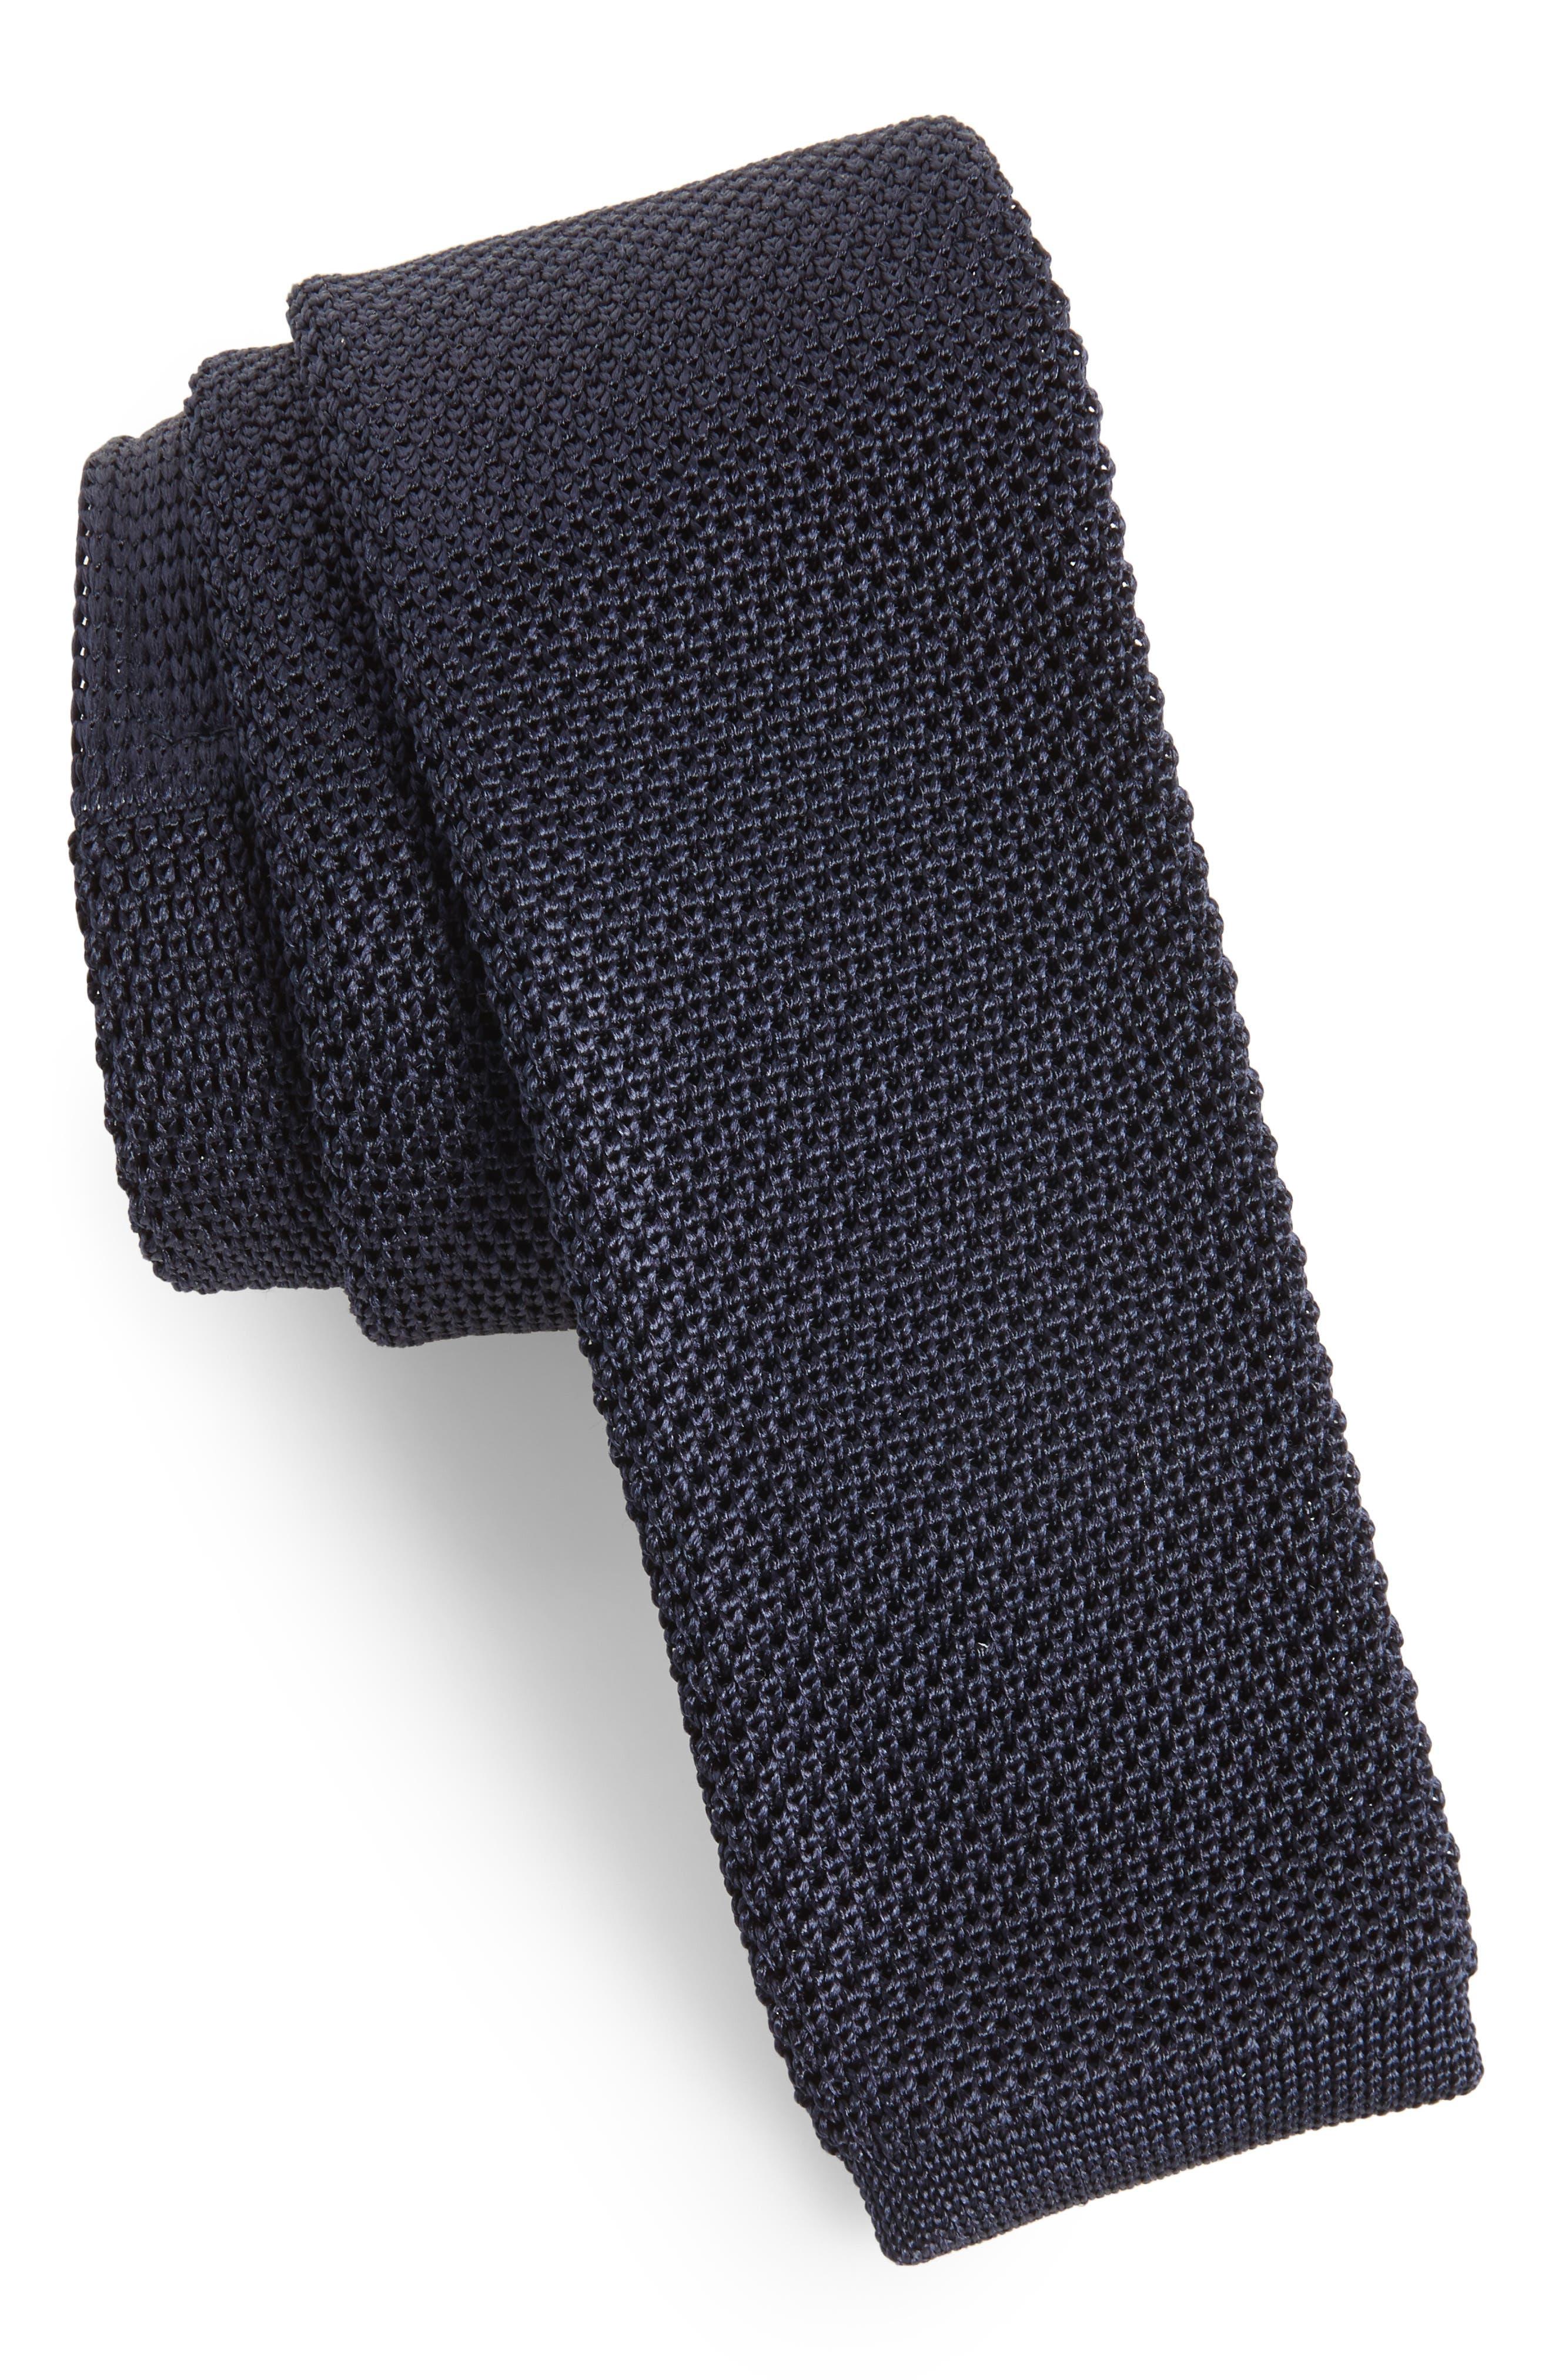 Alternate Image 1 Selected - Ted Baker London Birdseye Knit Silk Skinny Tie